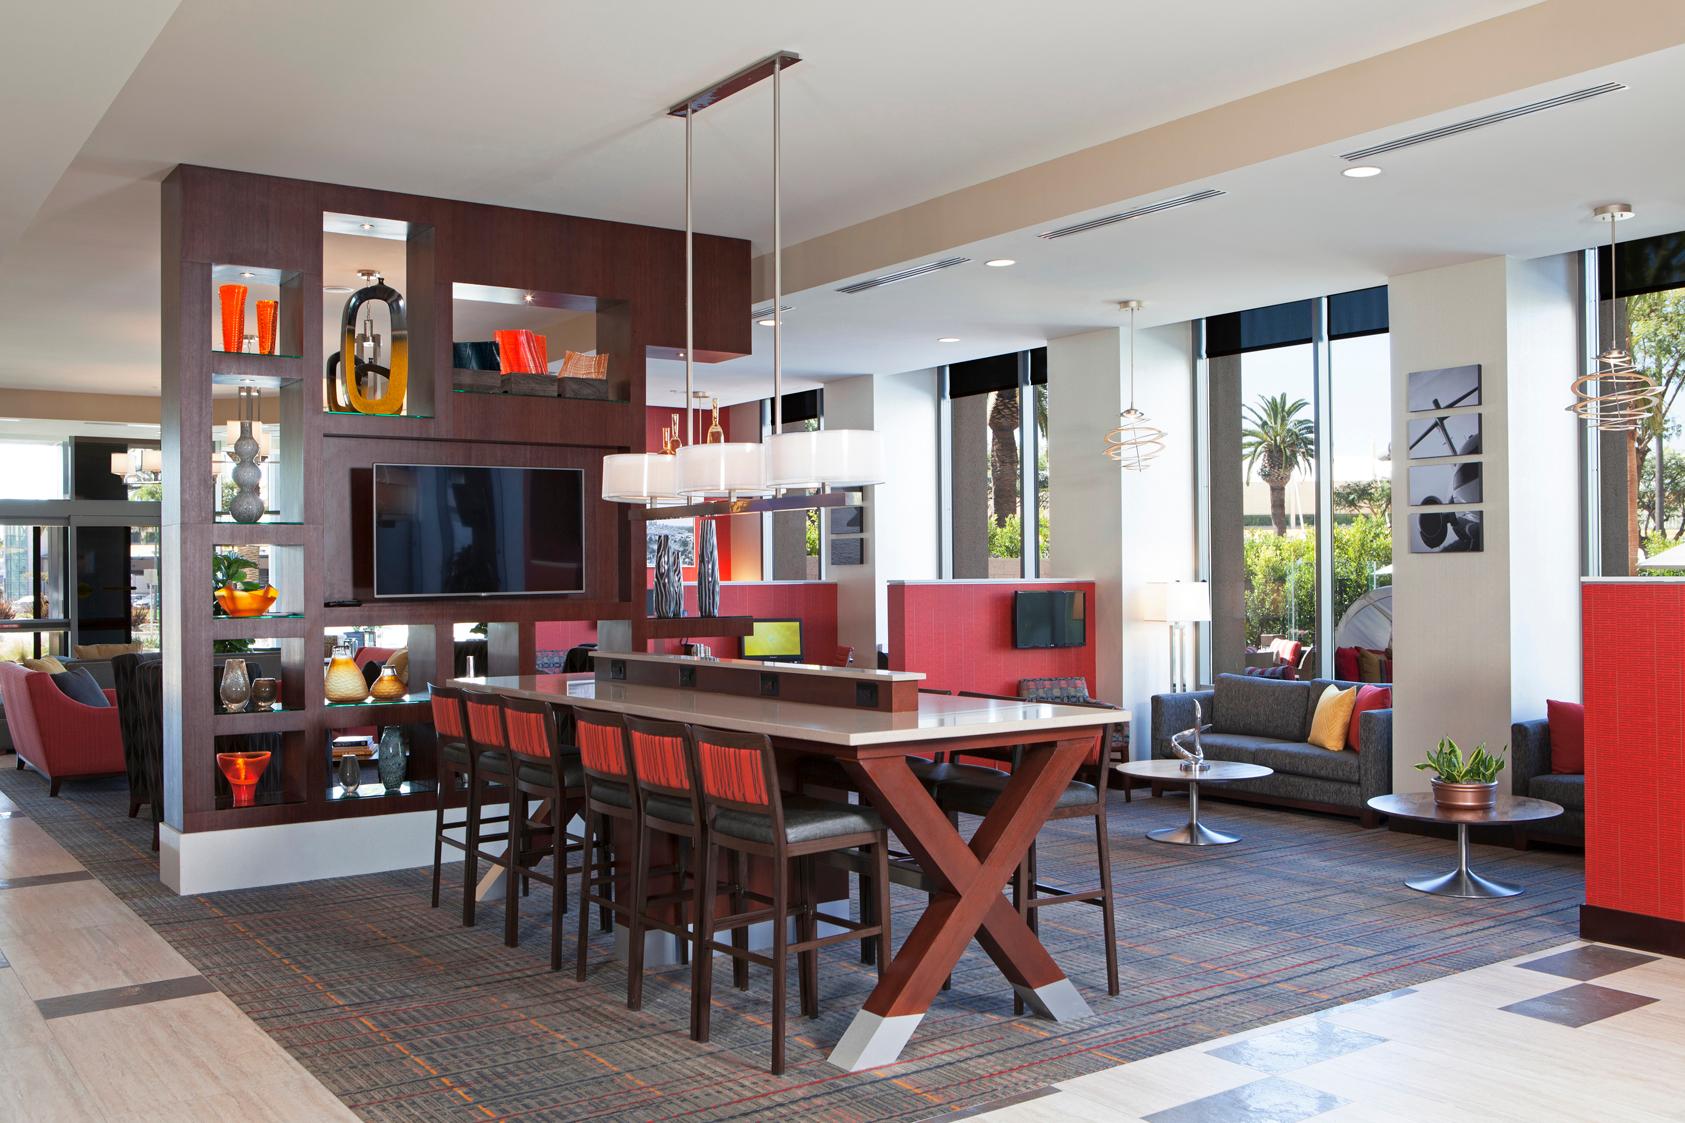 Residence Inn by Marriott Los Angeles LAX/Century Boulevard image 21